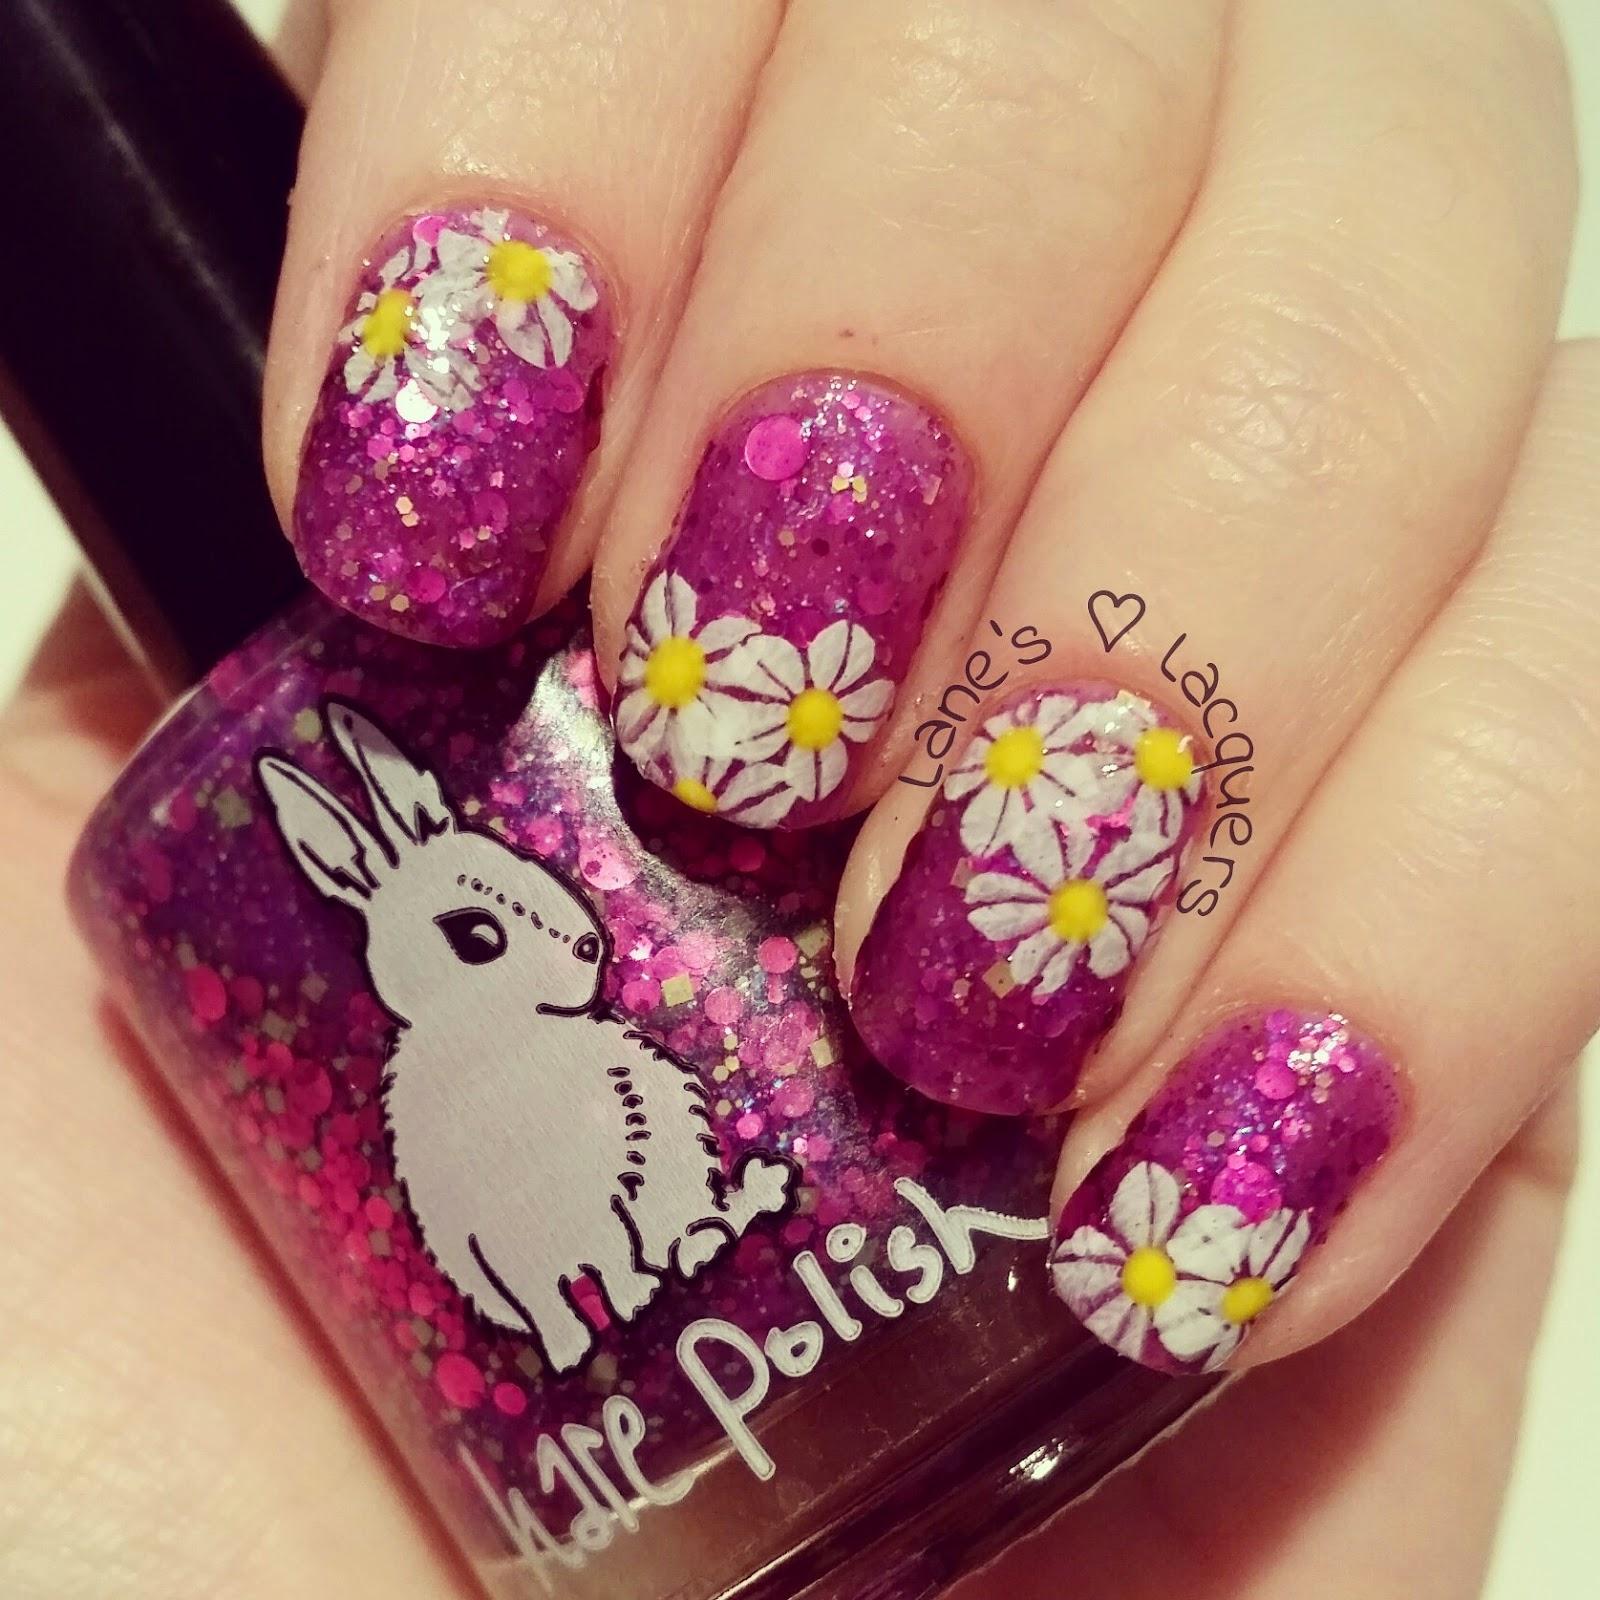 hare-polish-anemone-gardens-flower-nail-art (2)